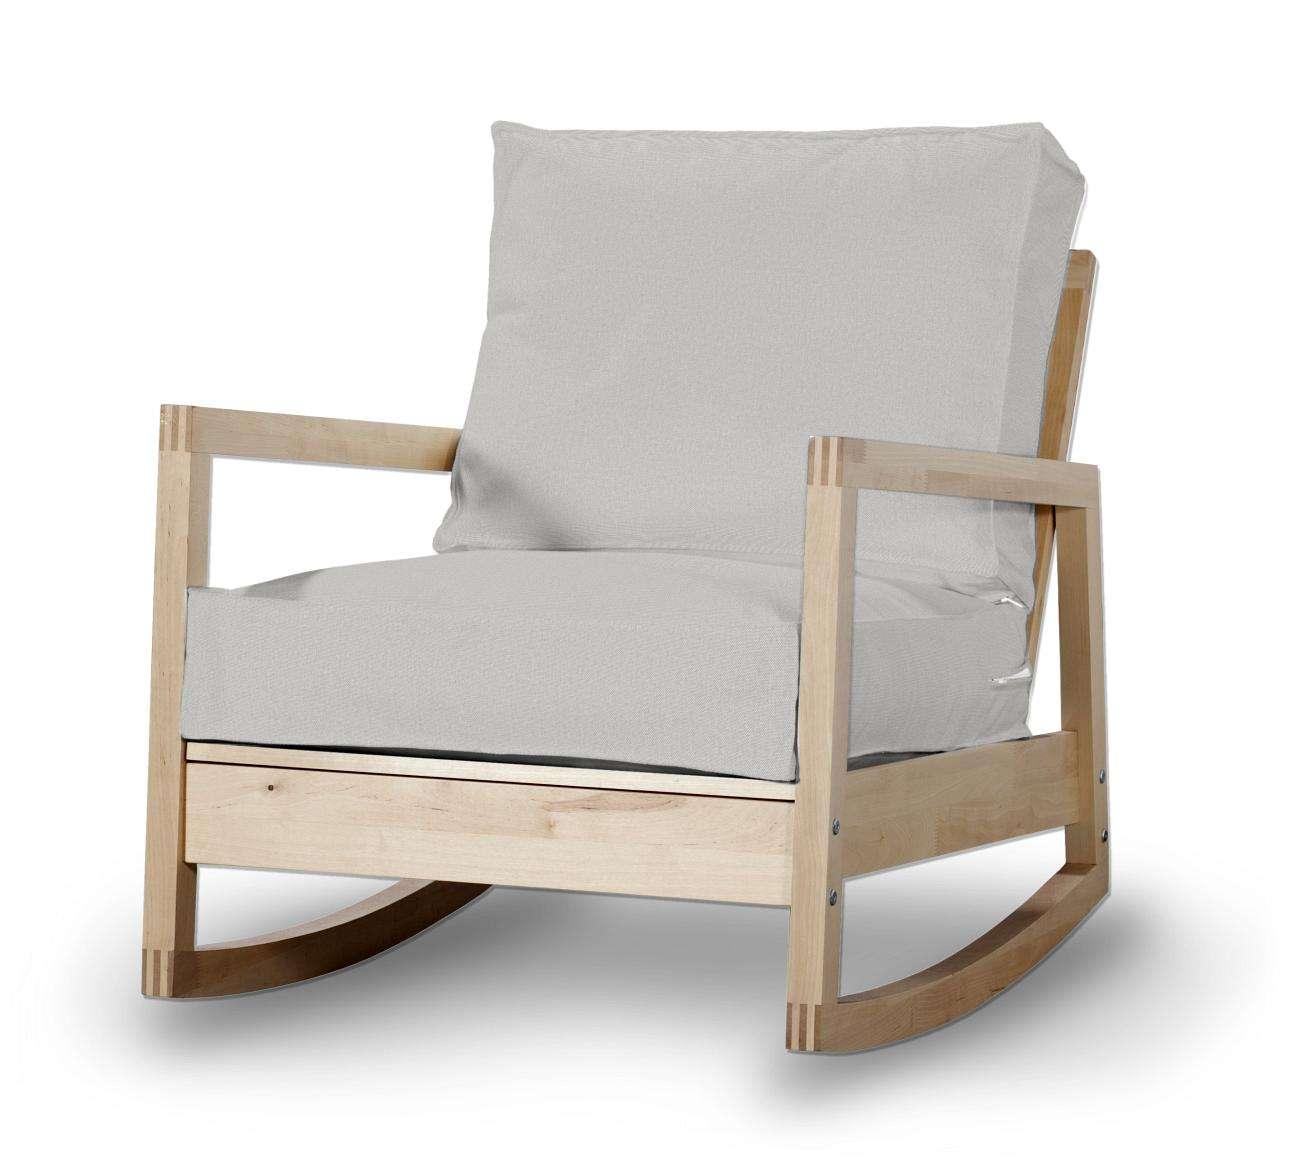 Lillberg Sesselbezug Sesselhusse, Modell Lillberg von der Kollektion Etna, Stoff: 705-90